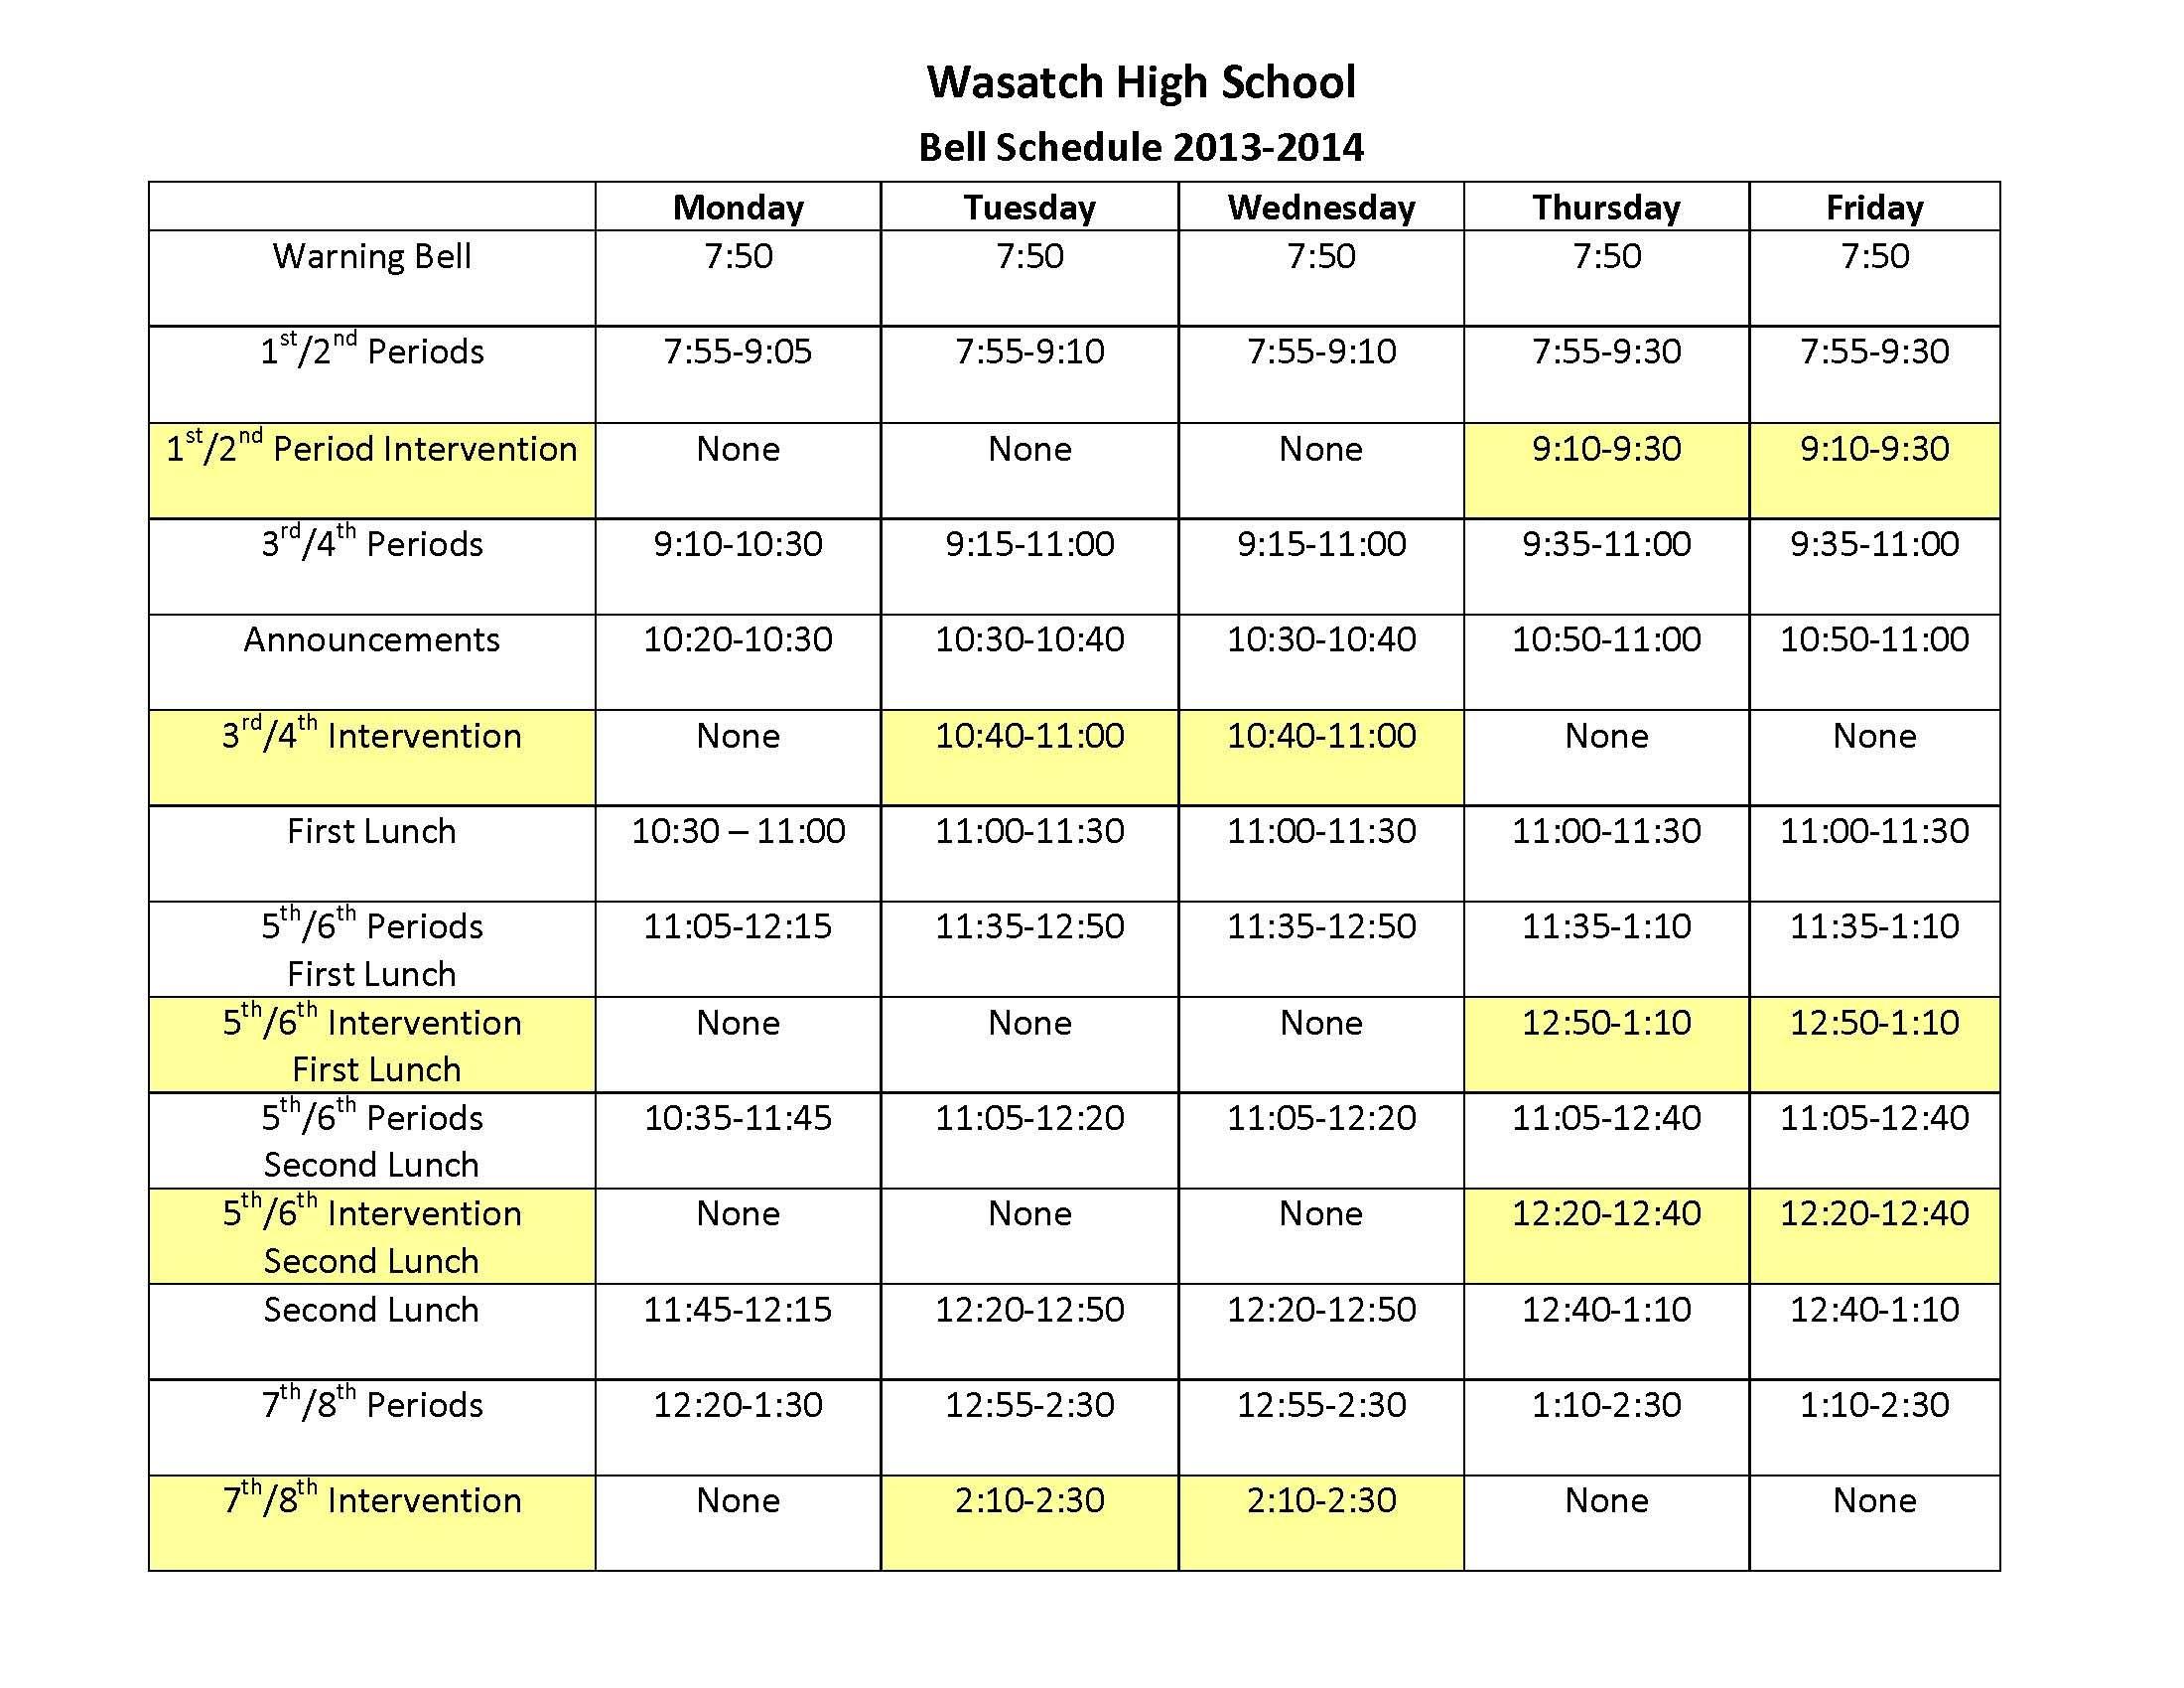 Wasatch High School Bell Schedule